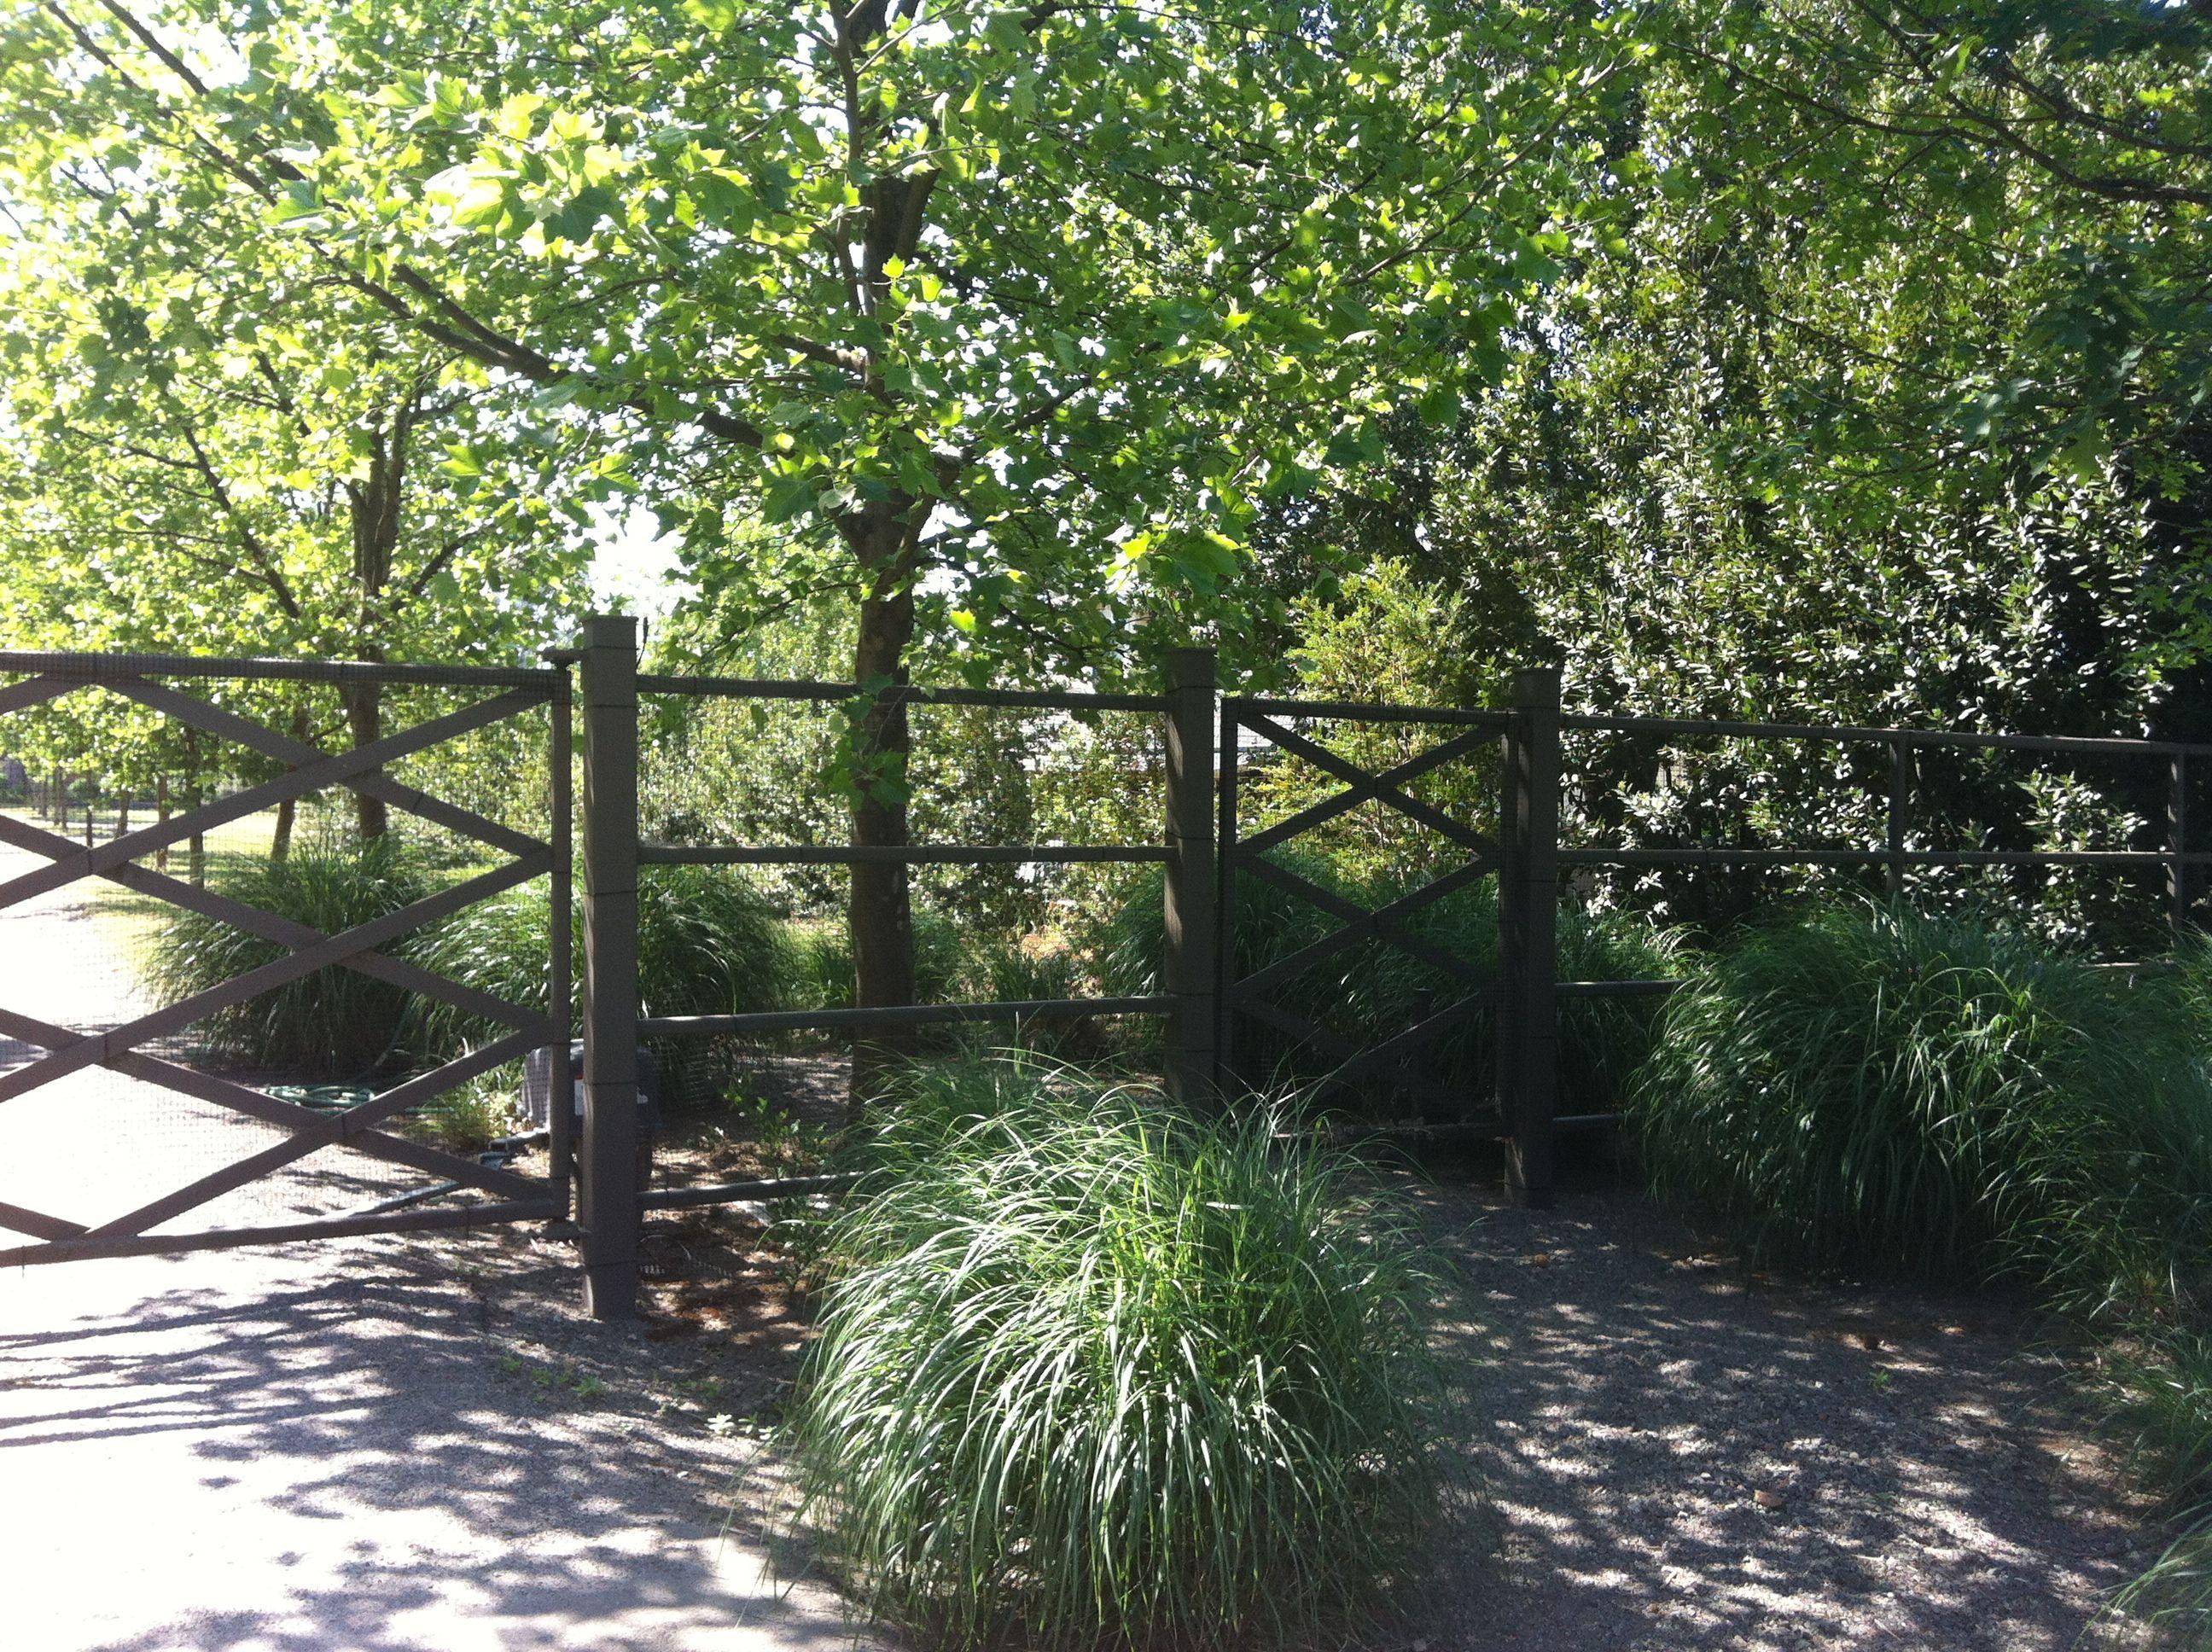 Landscaping Mulch Regina : Pin by regina rollin sonoma landscape design on client board califori